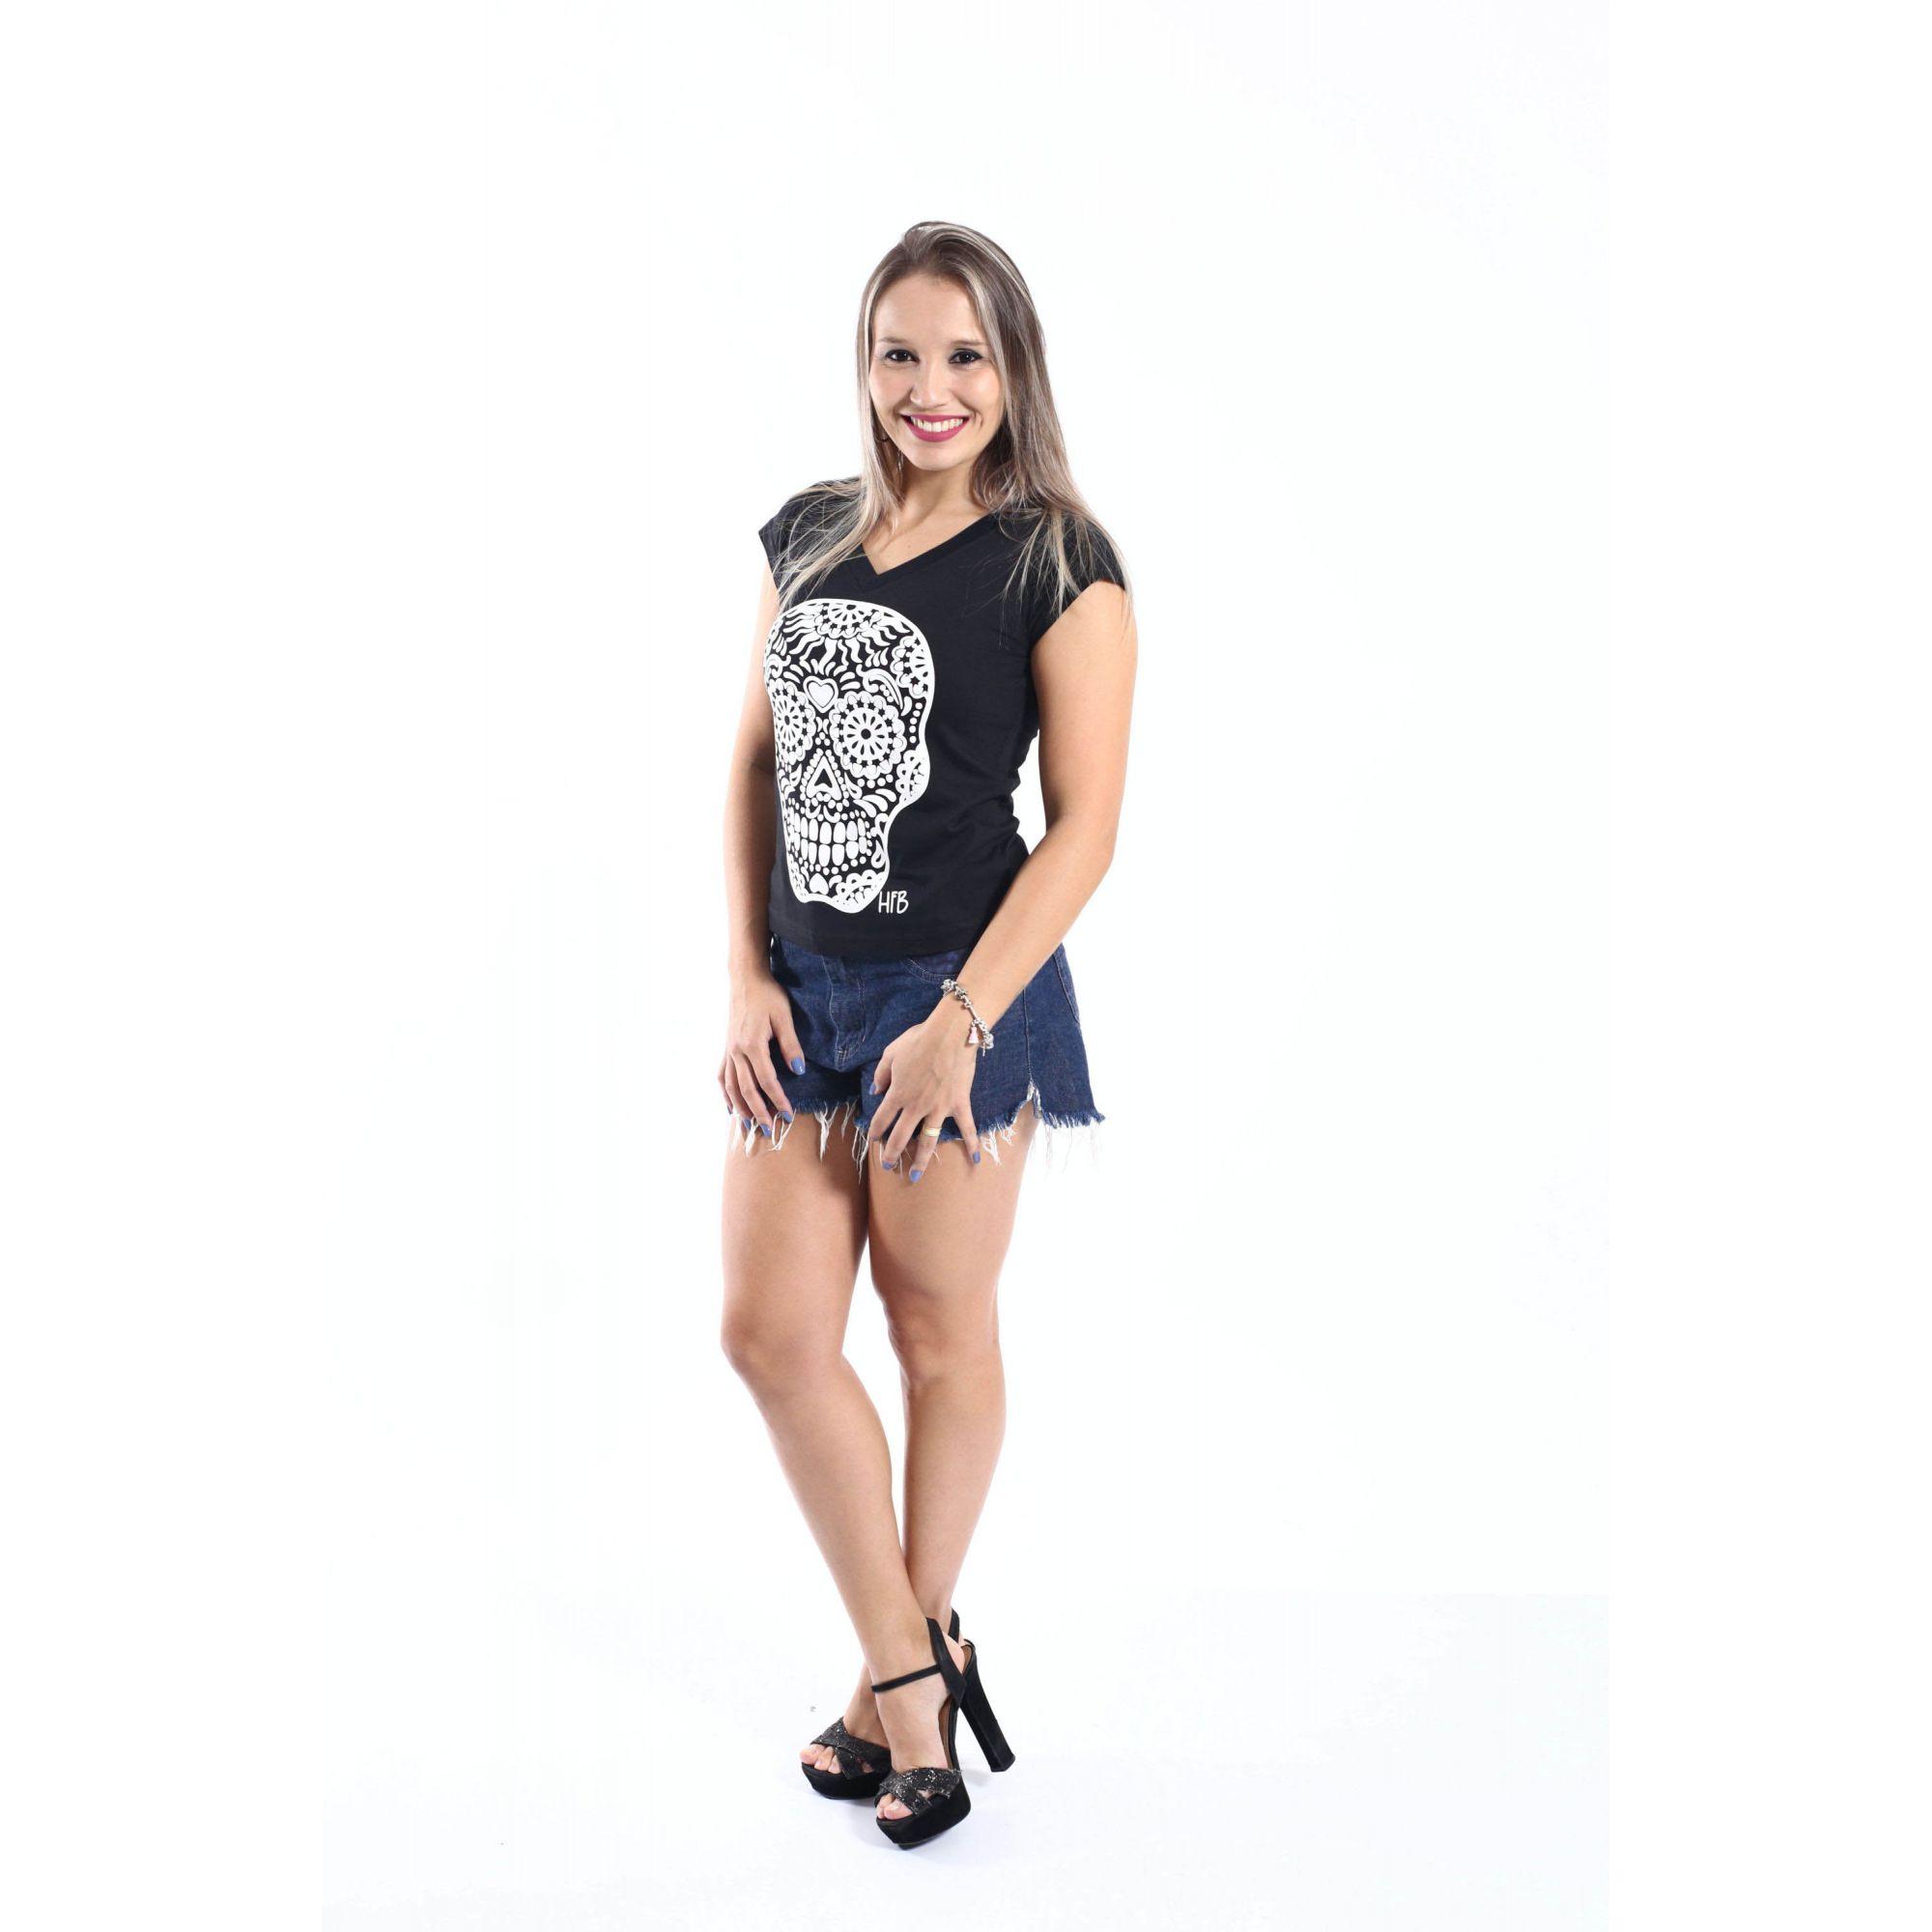 Camiseta Feminina Preta Caveira Alto Relevo  - Heitor Fashion Brazil